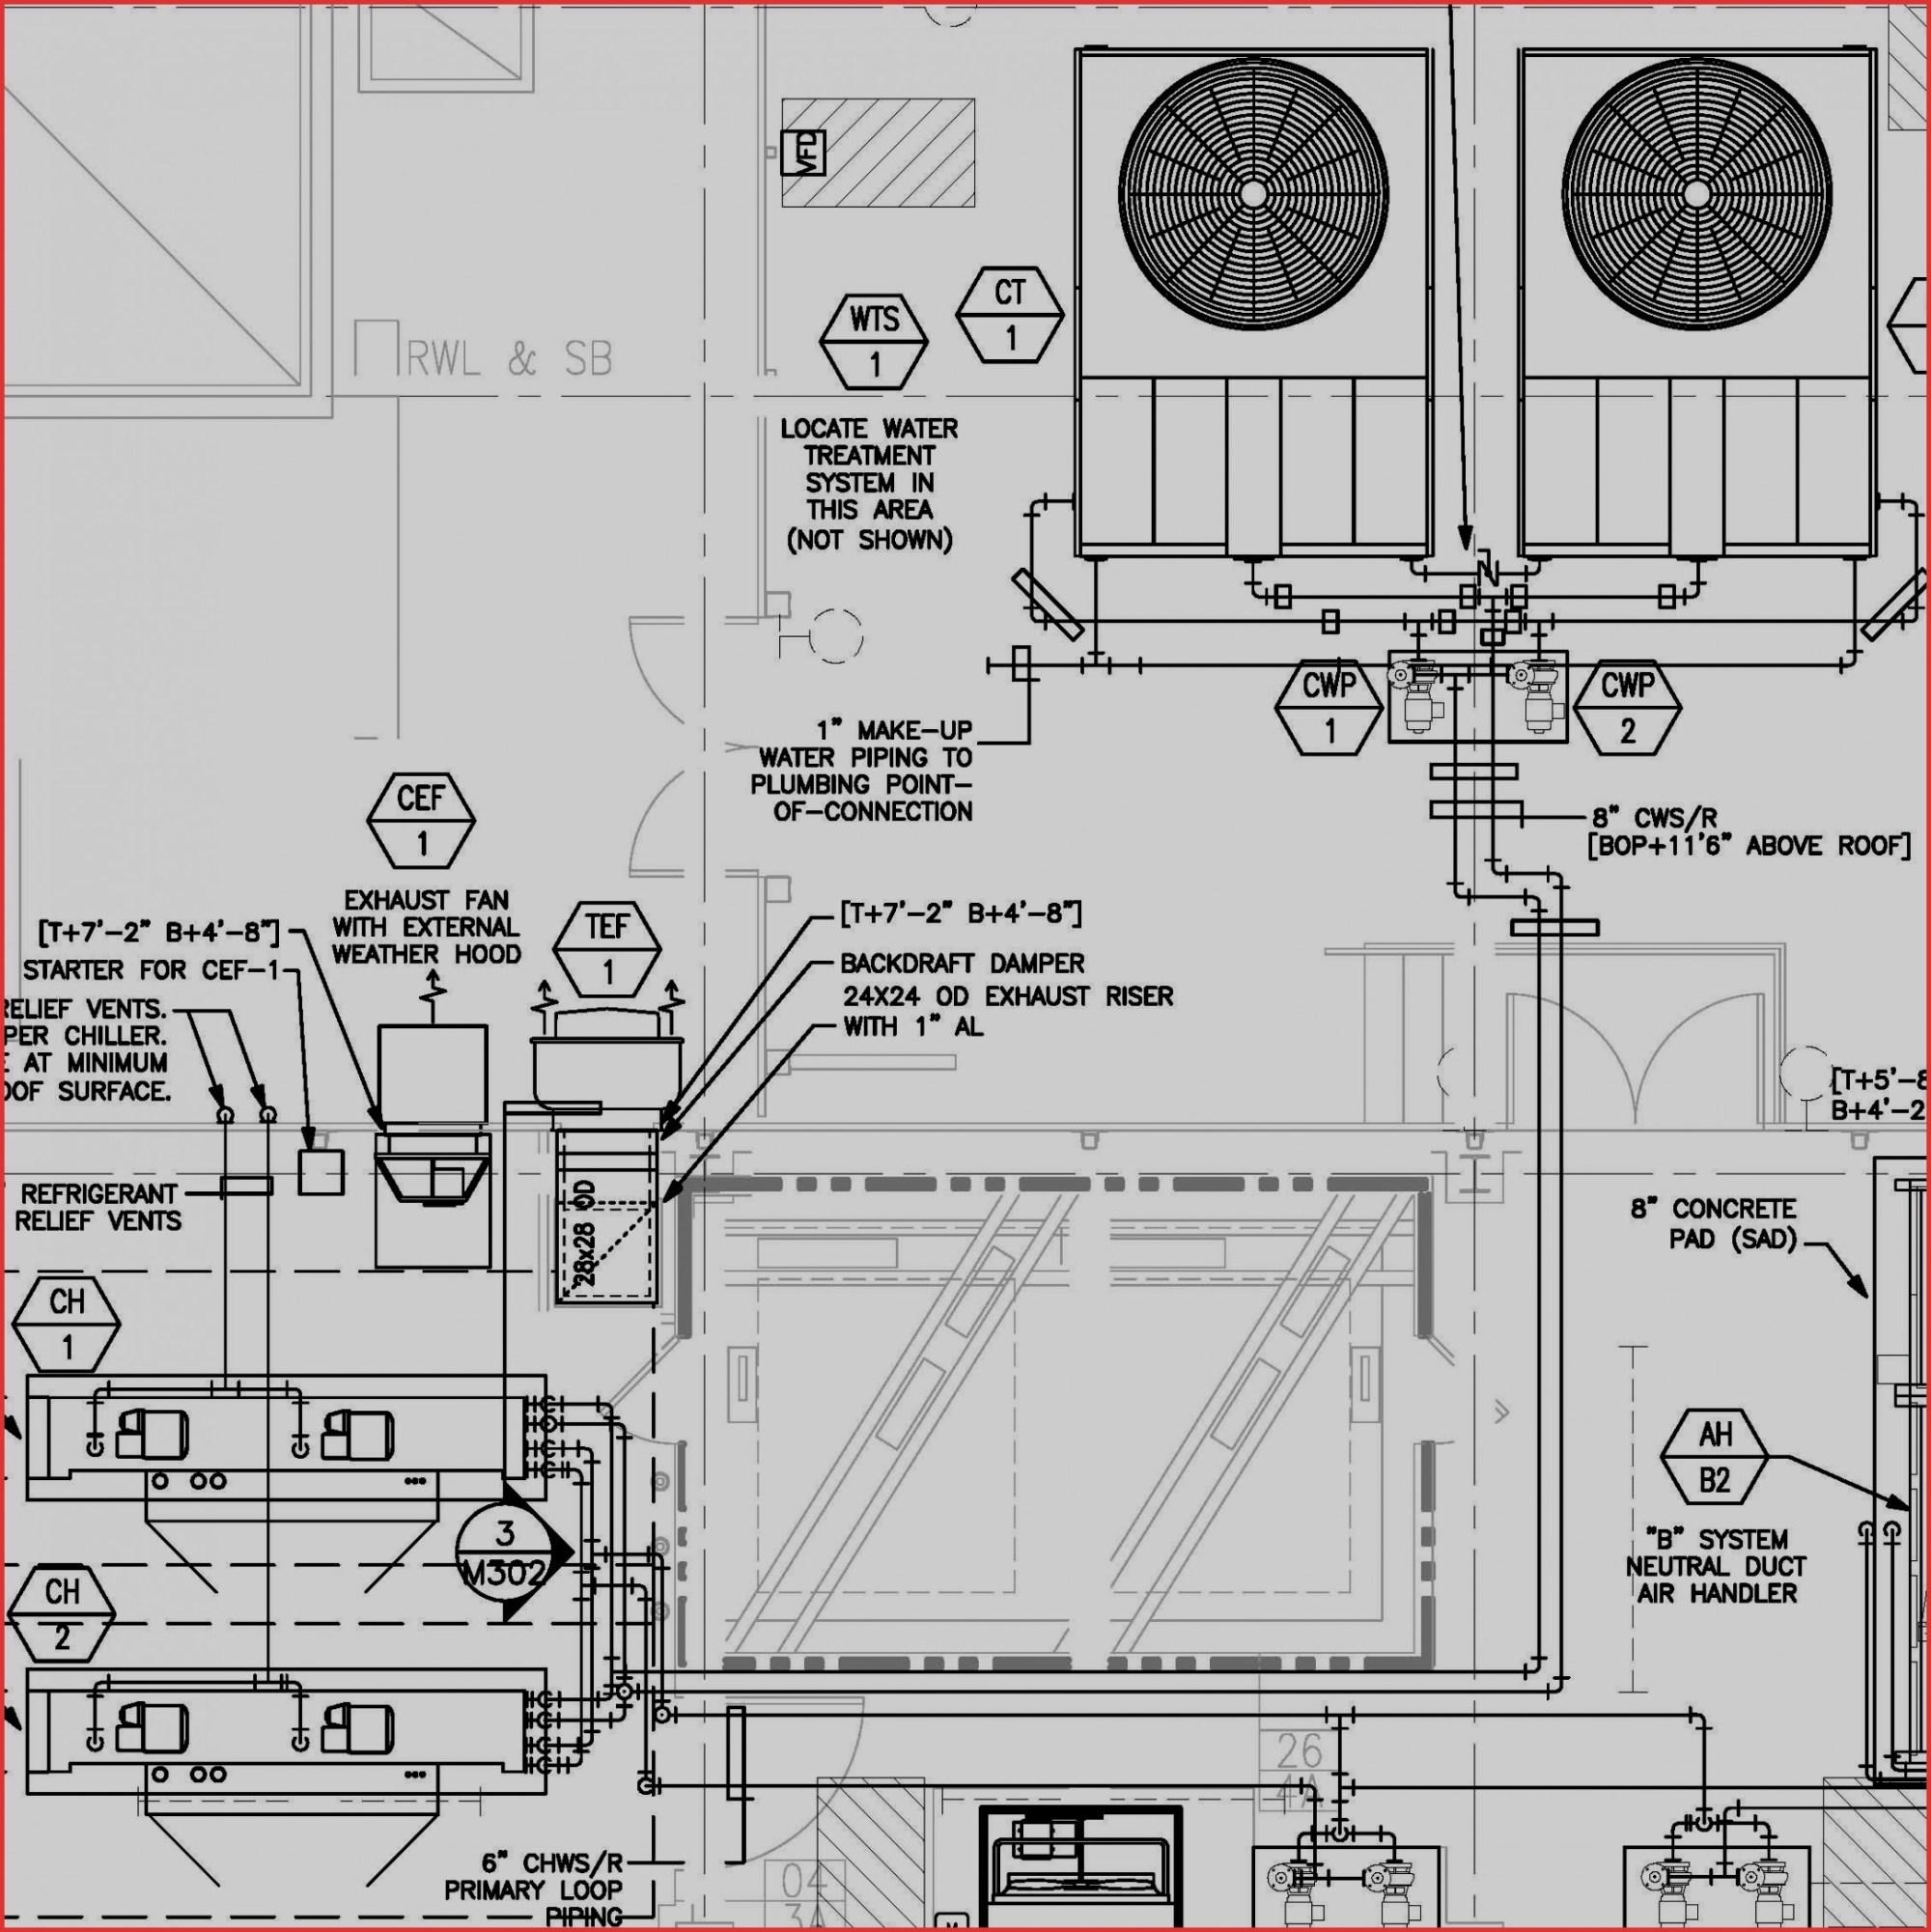 hight resolution of 2000 isuzu rodeo engine diagram 94 isuzu npr wiring diagram wiring diagrams konsult